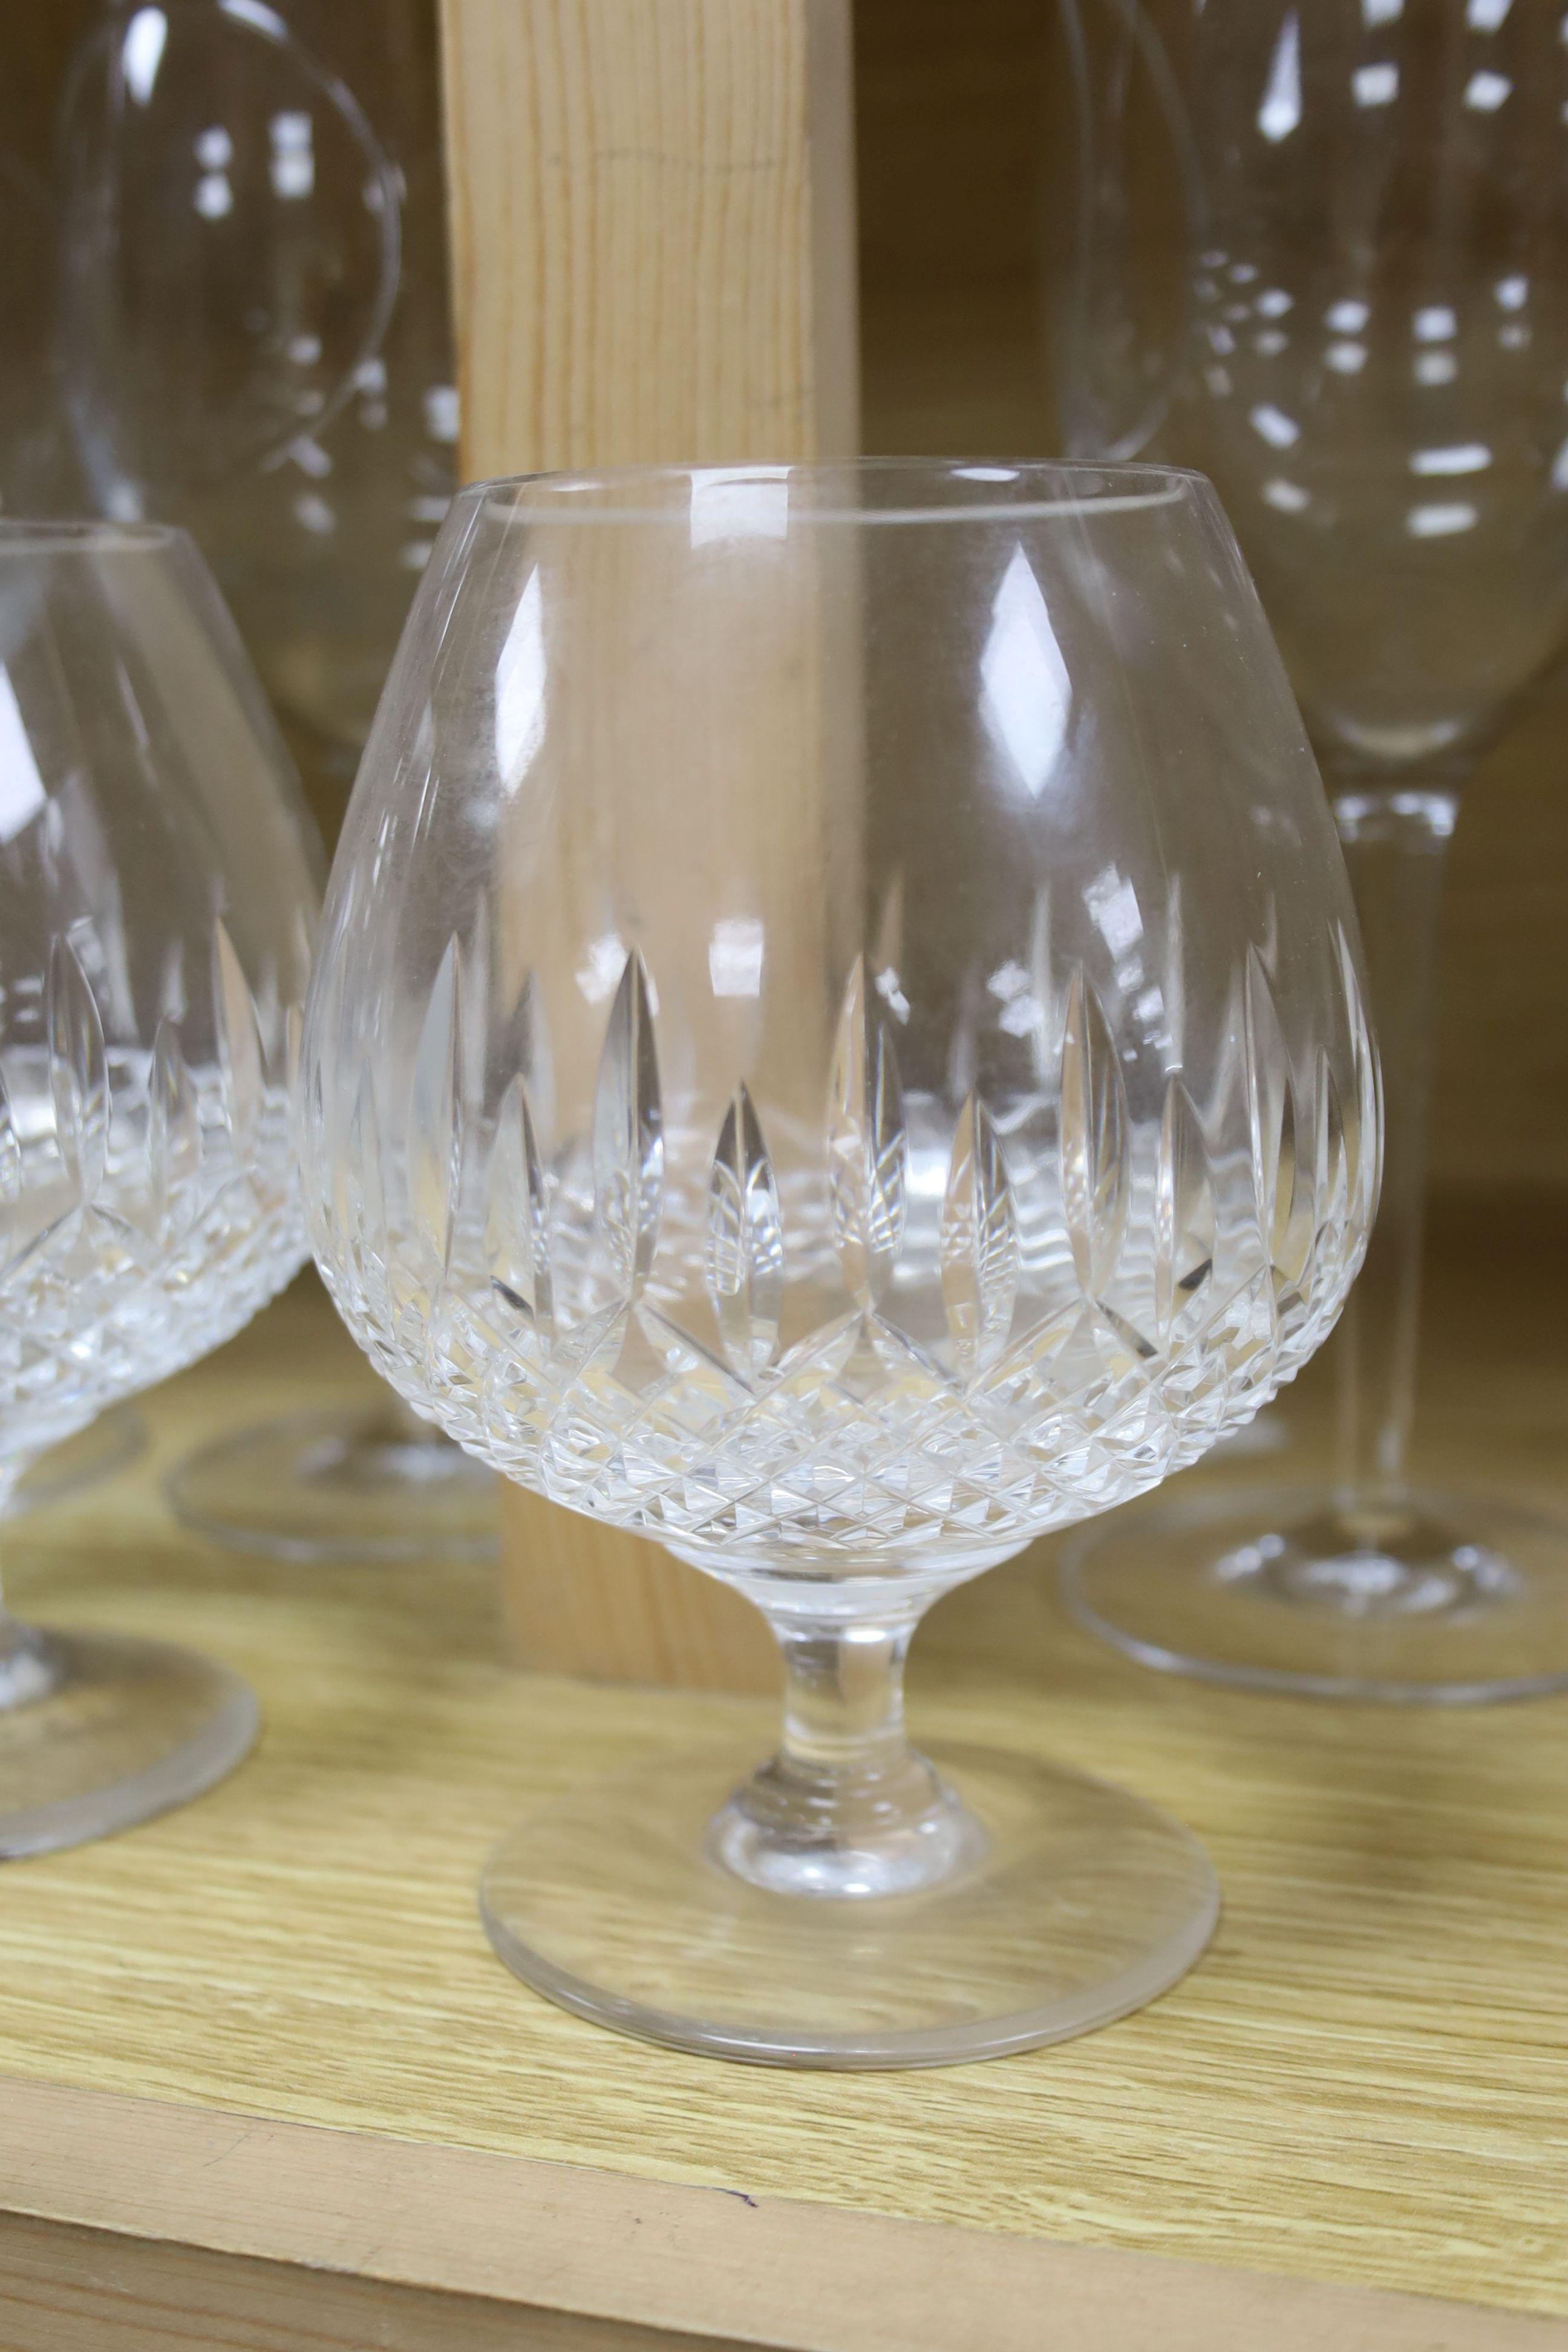 Four John Rocha Waterford wine glasses and three Stuart cut glass brandy glasses - Image 2 of 4